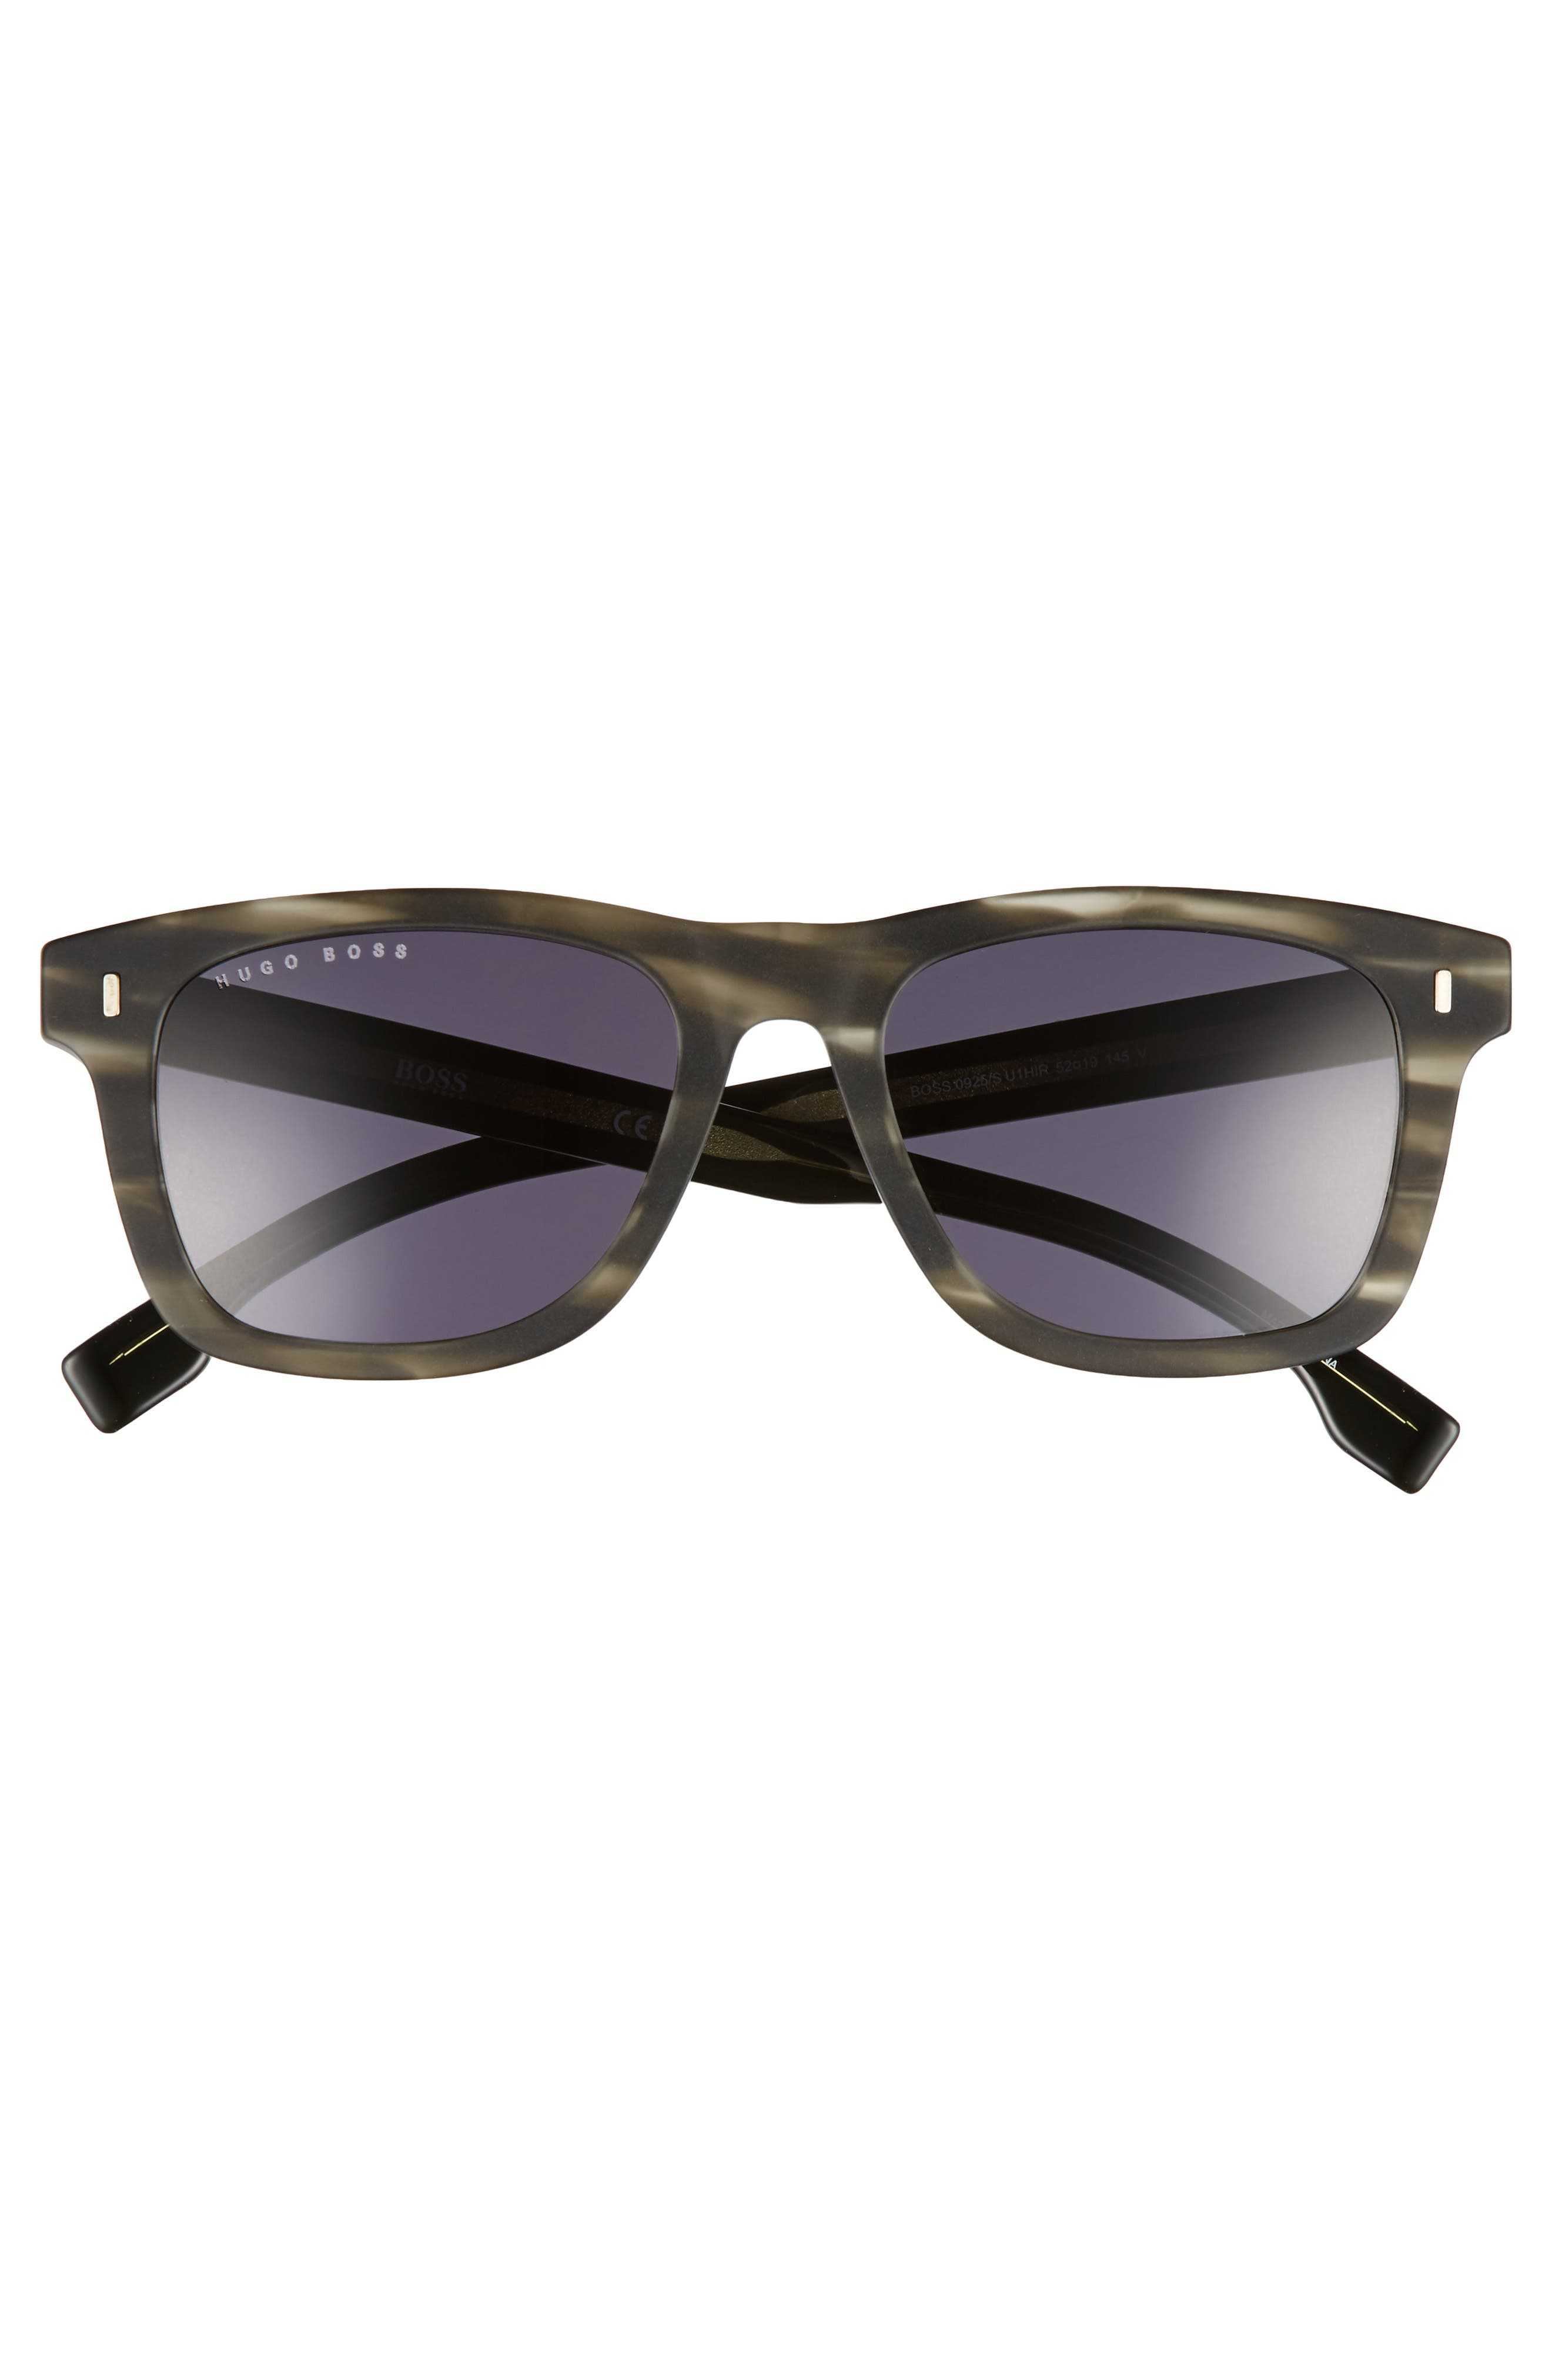 52mm Sunglasses,                             Alternate thumbnail 4, color,